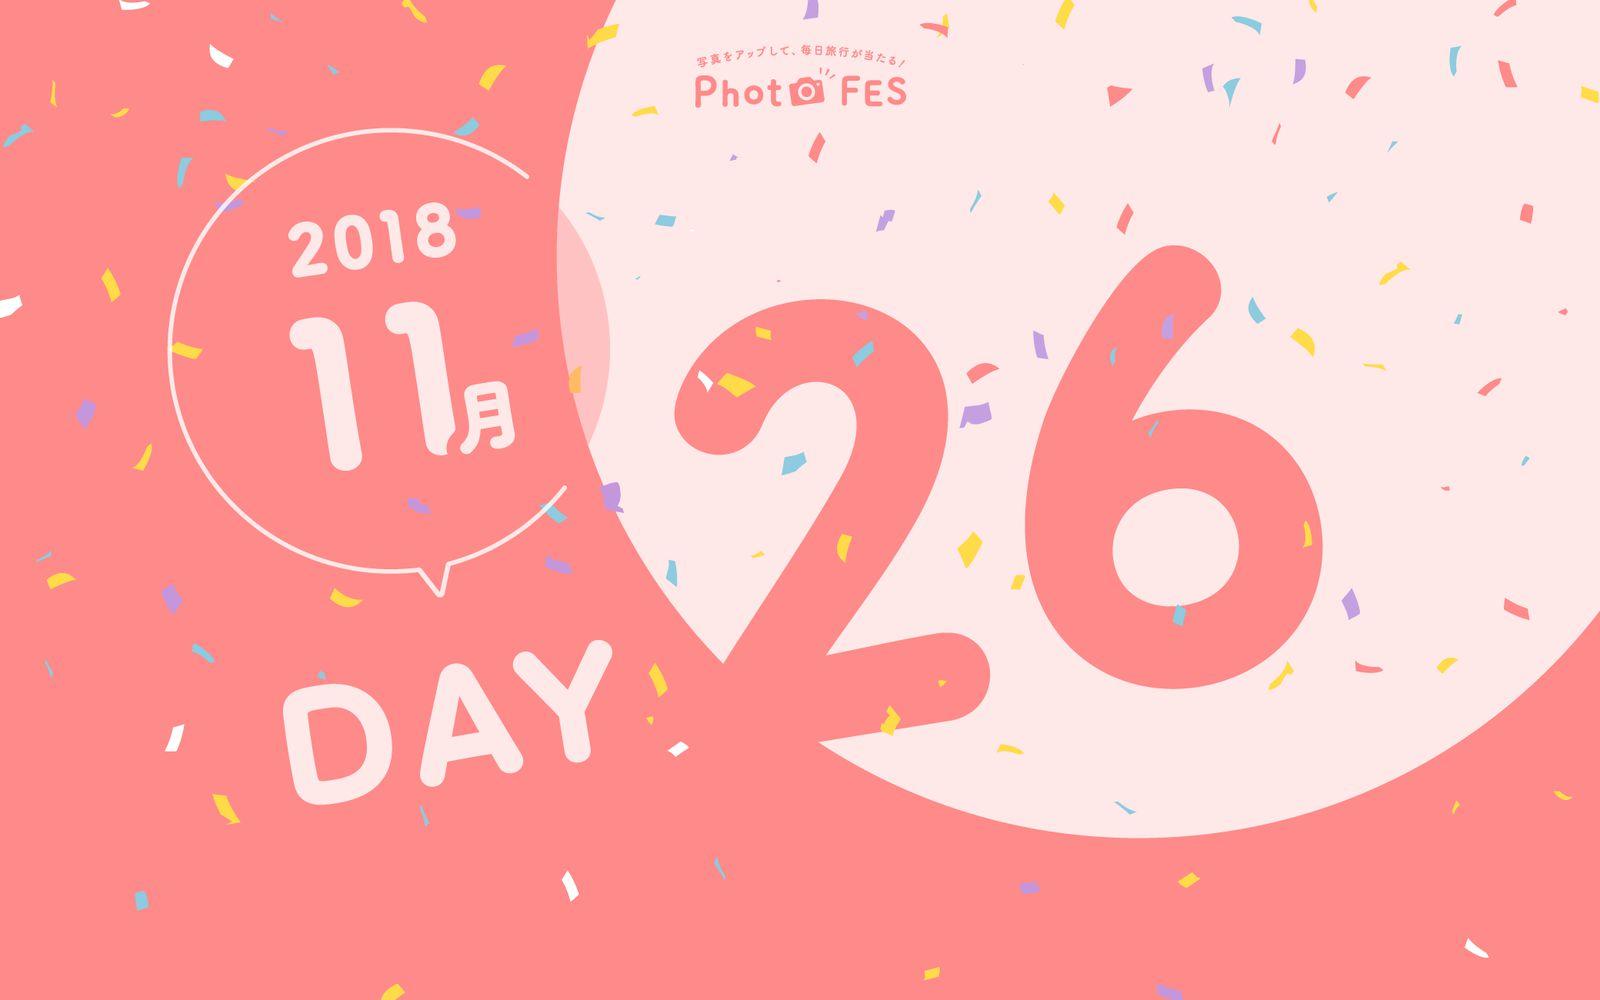 【DAY26】「Photo FES 2018 Autumn」11月26日投稿分であたる賞品&受賞者発表